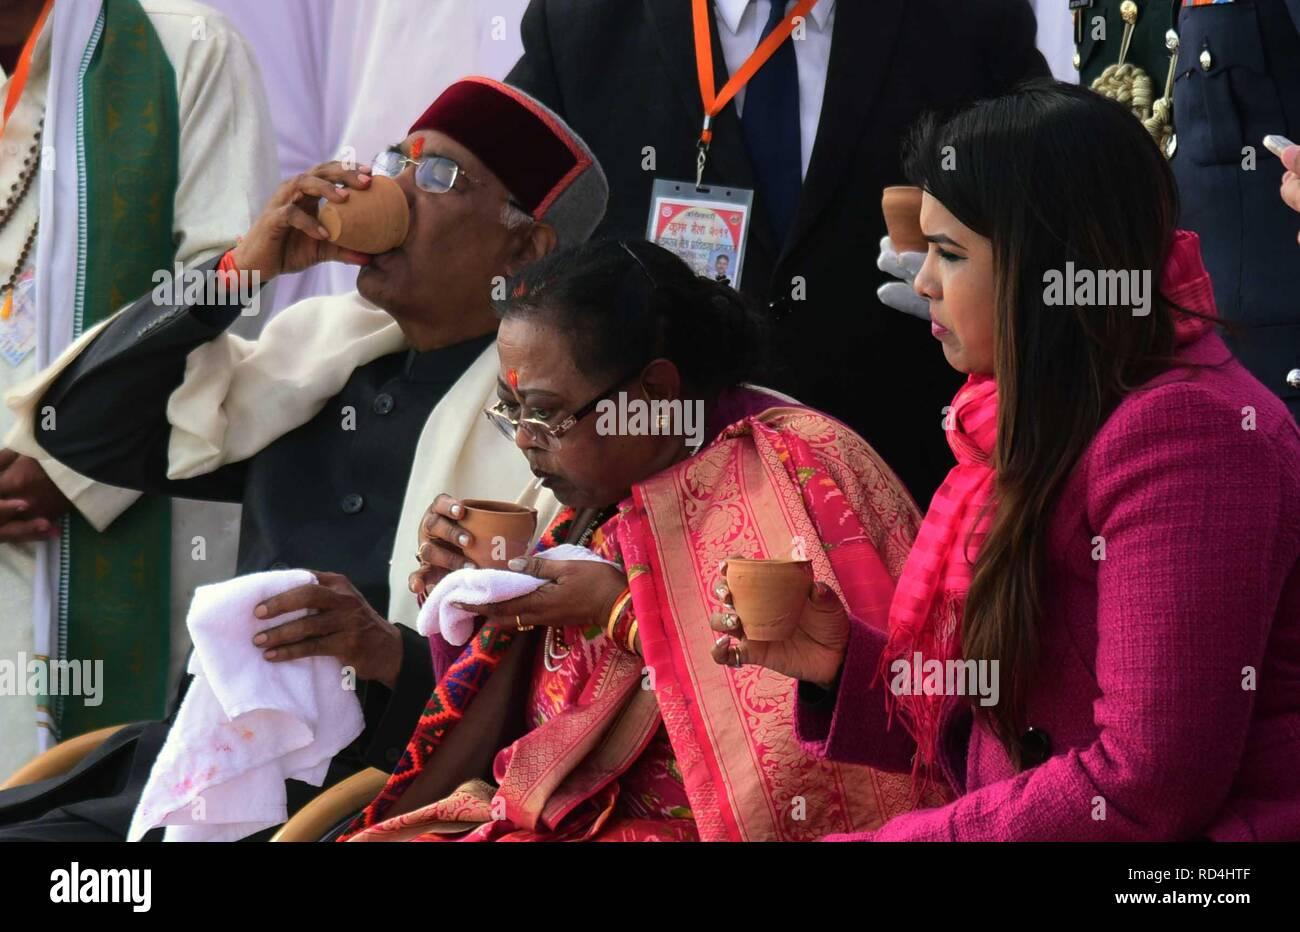 Allahabad, Uttar Pradesh, India. 17th Jan, 2019. Allahabad: President Ram Nath Kovind along with his family at Sangam in Allahabad on 17-01-2019. Credit: Prabhat Kumar Verma/ZUMA Wire/Alamy Live News Stock Photo